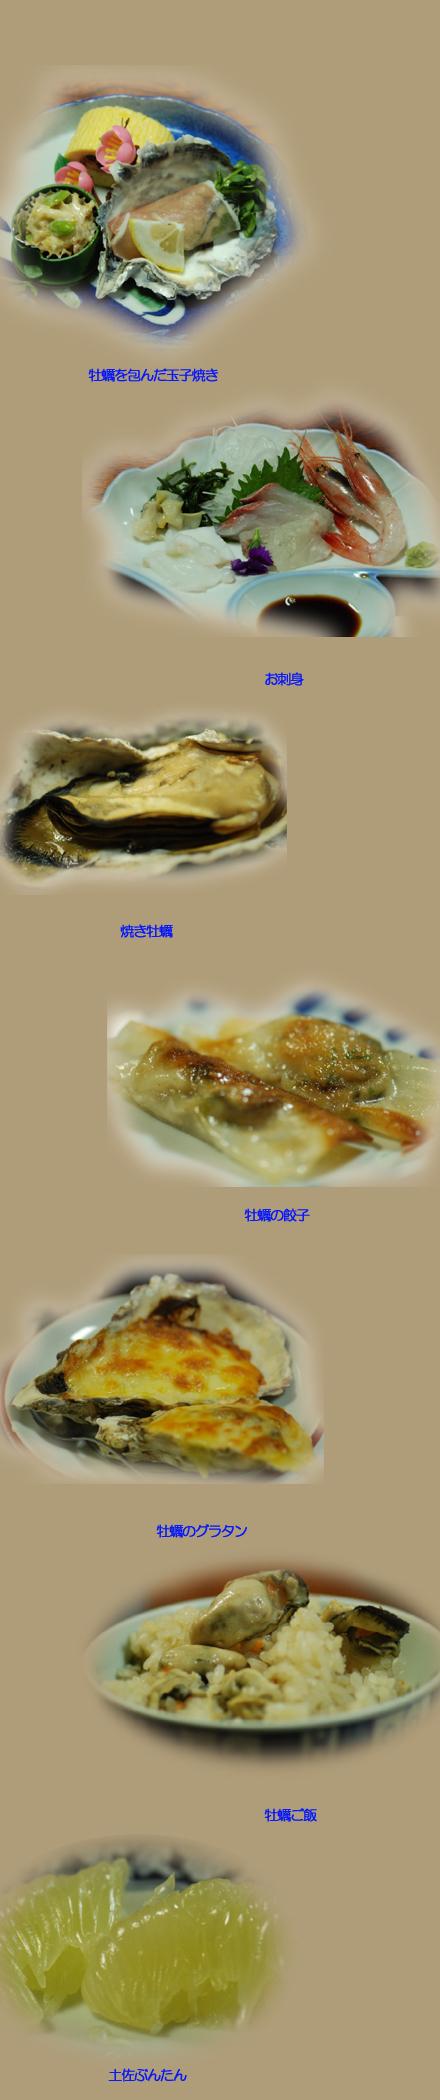 konshin2439c.jpg